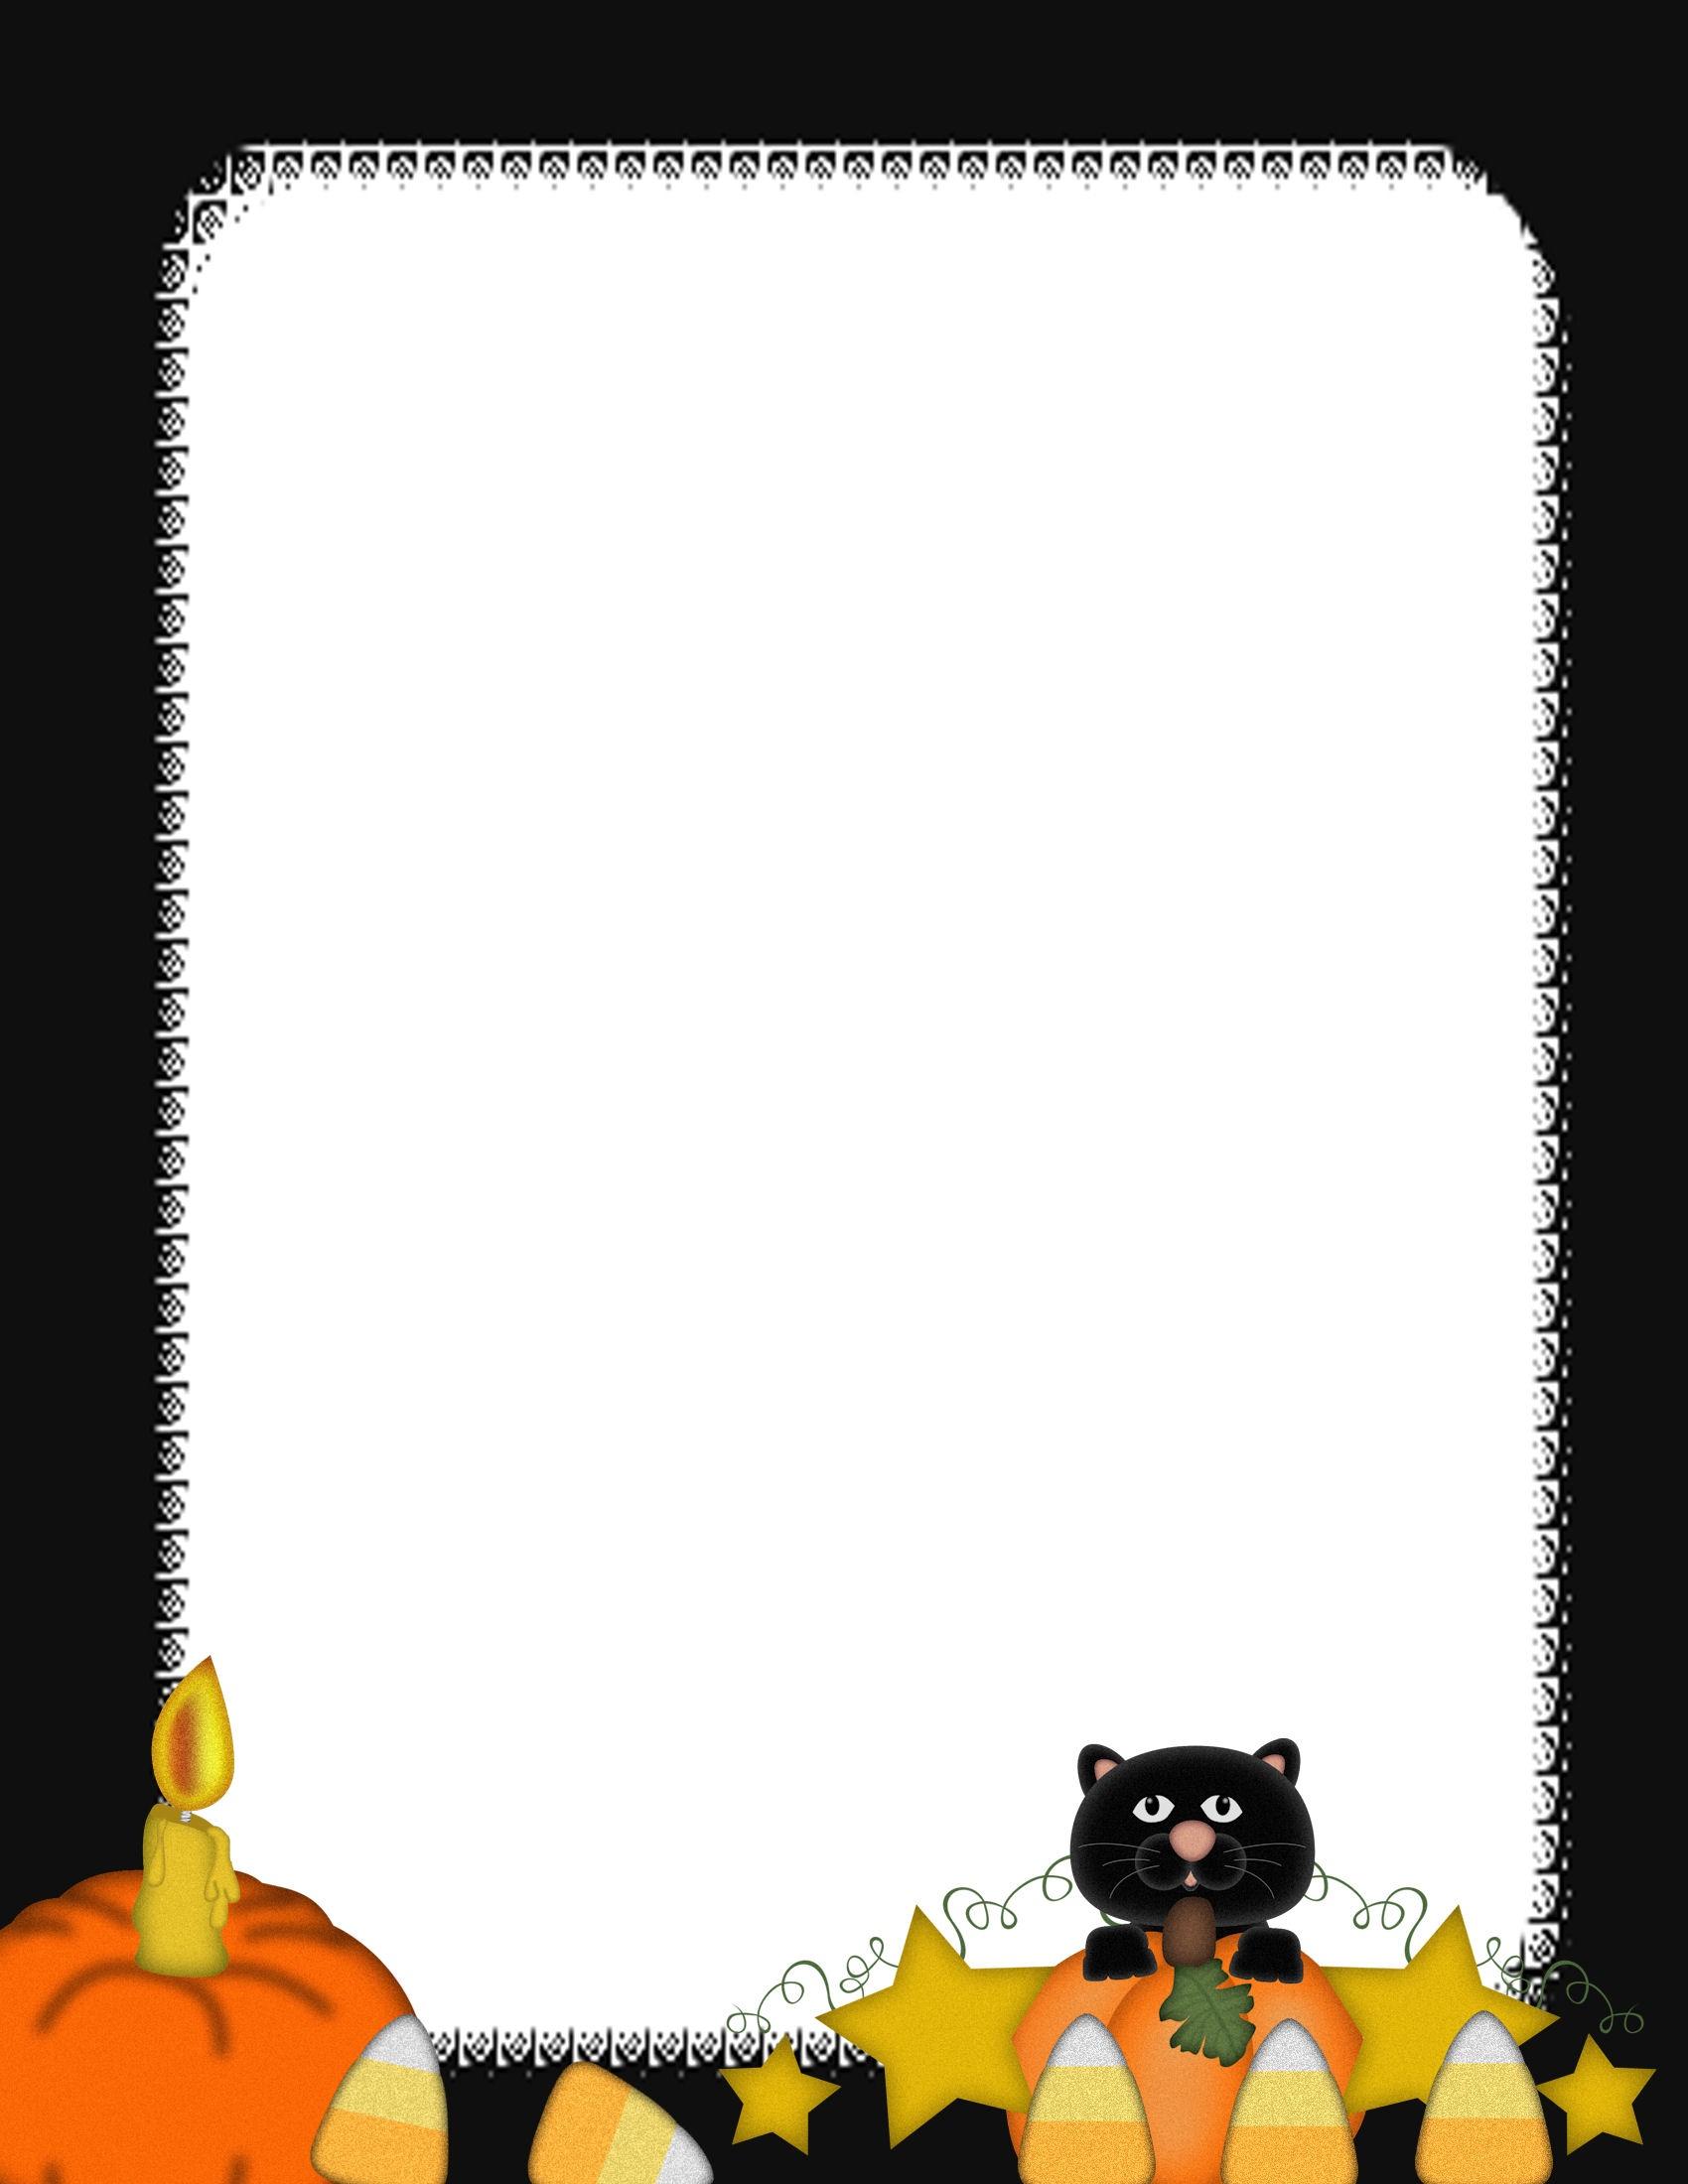 Free Halloween Stationery Templates - Tutlin.psstech.co - Free Printable Halloween Stationery